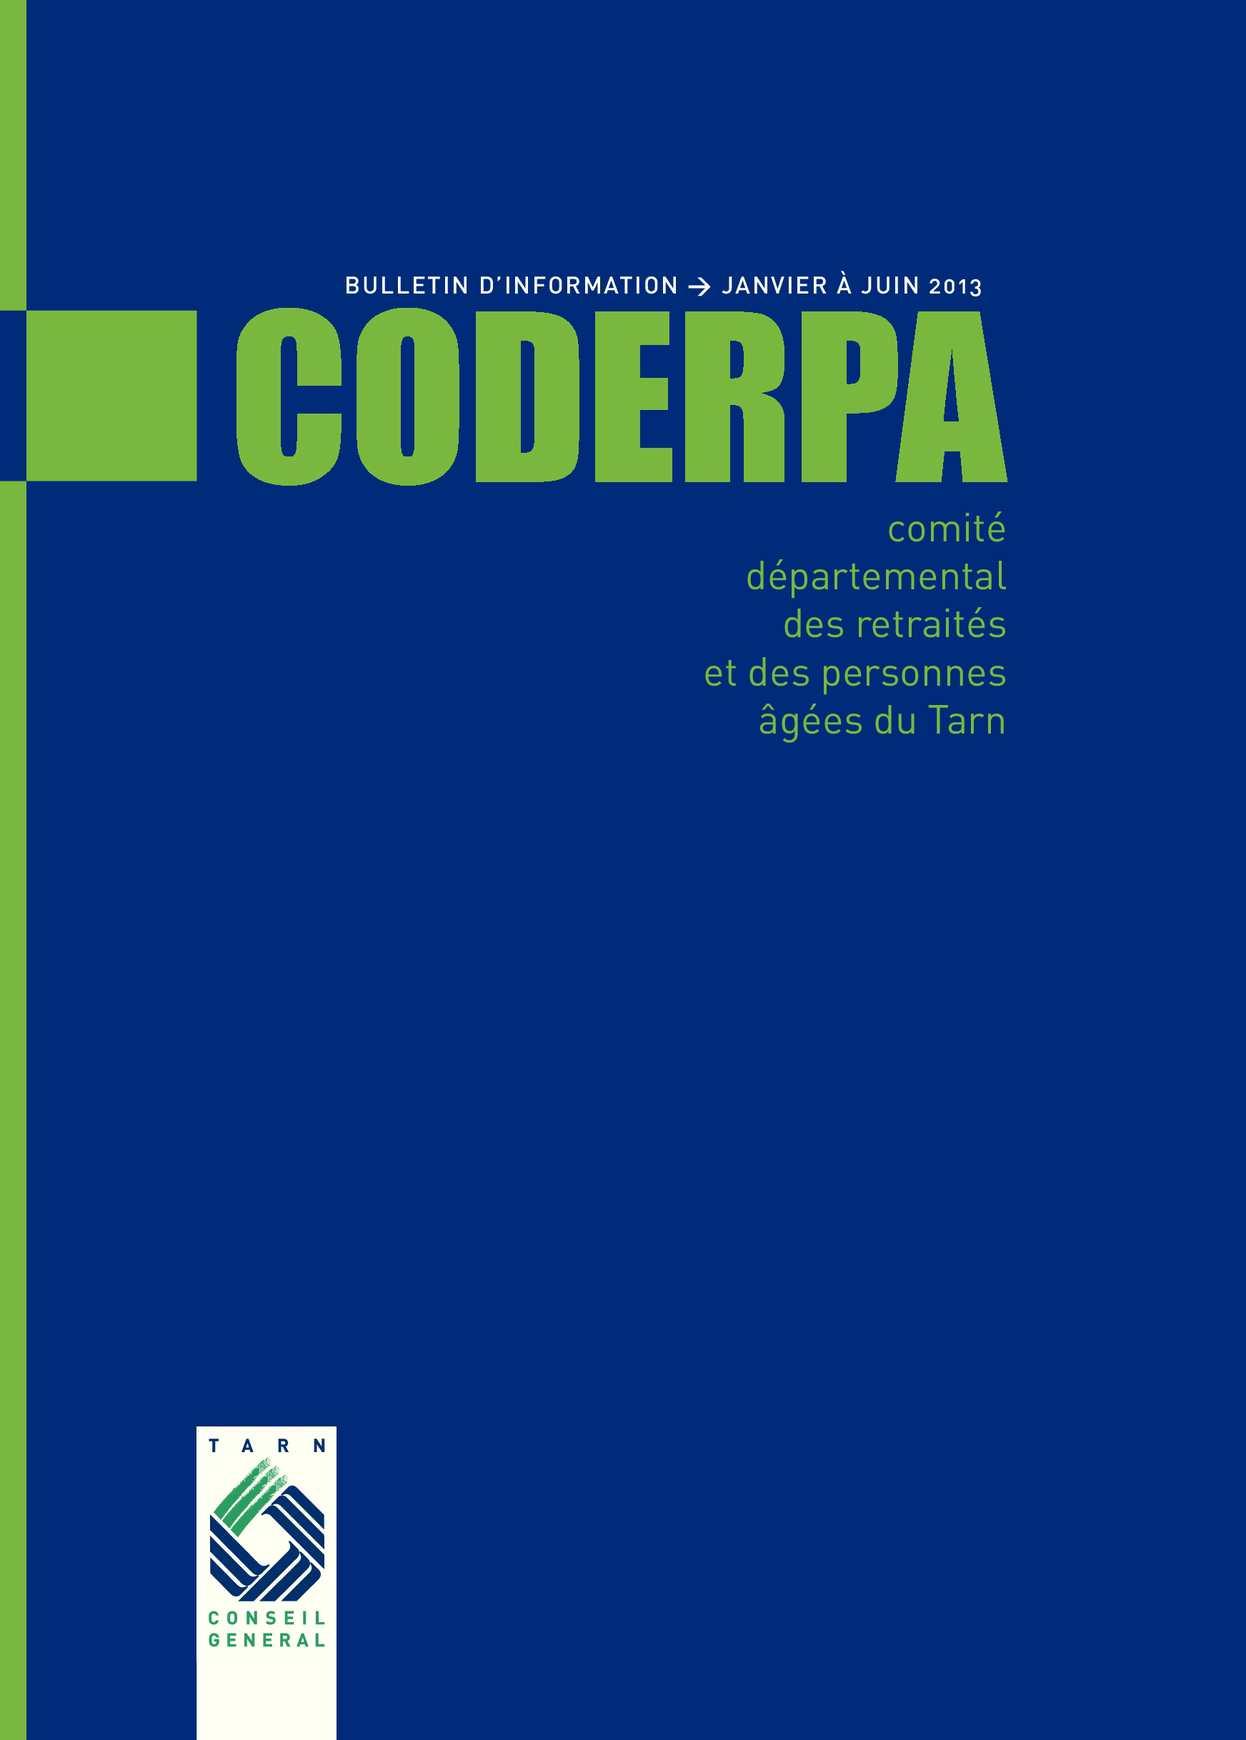 Bulletin du CODERPA Janvier/Juin 2013